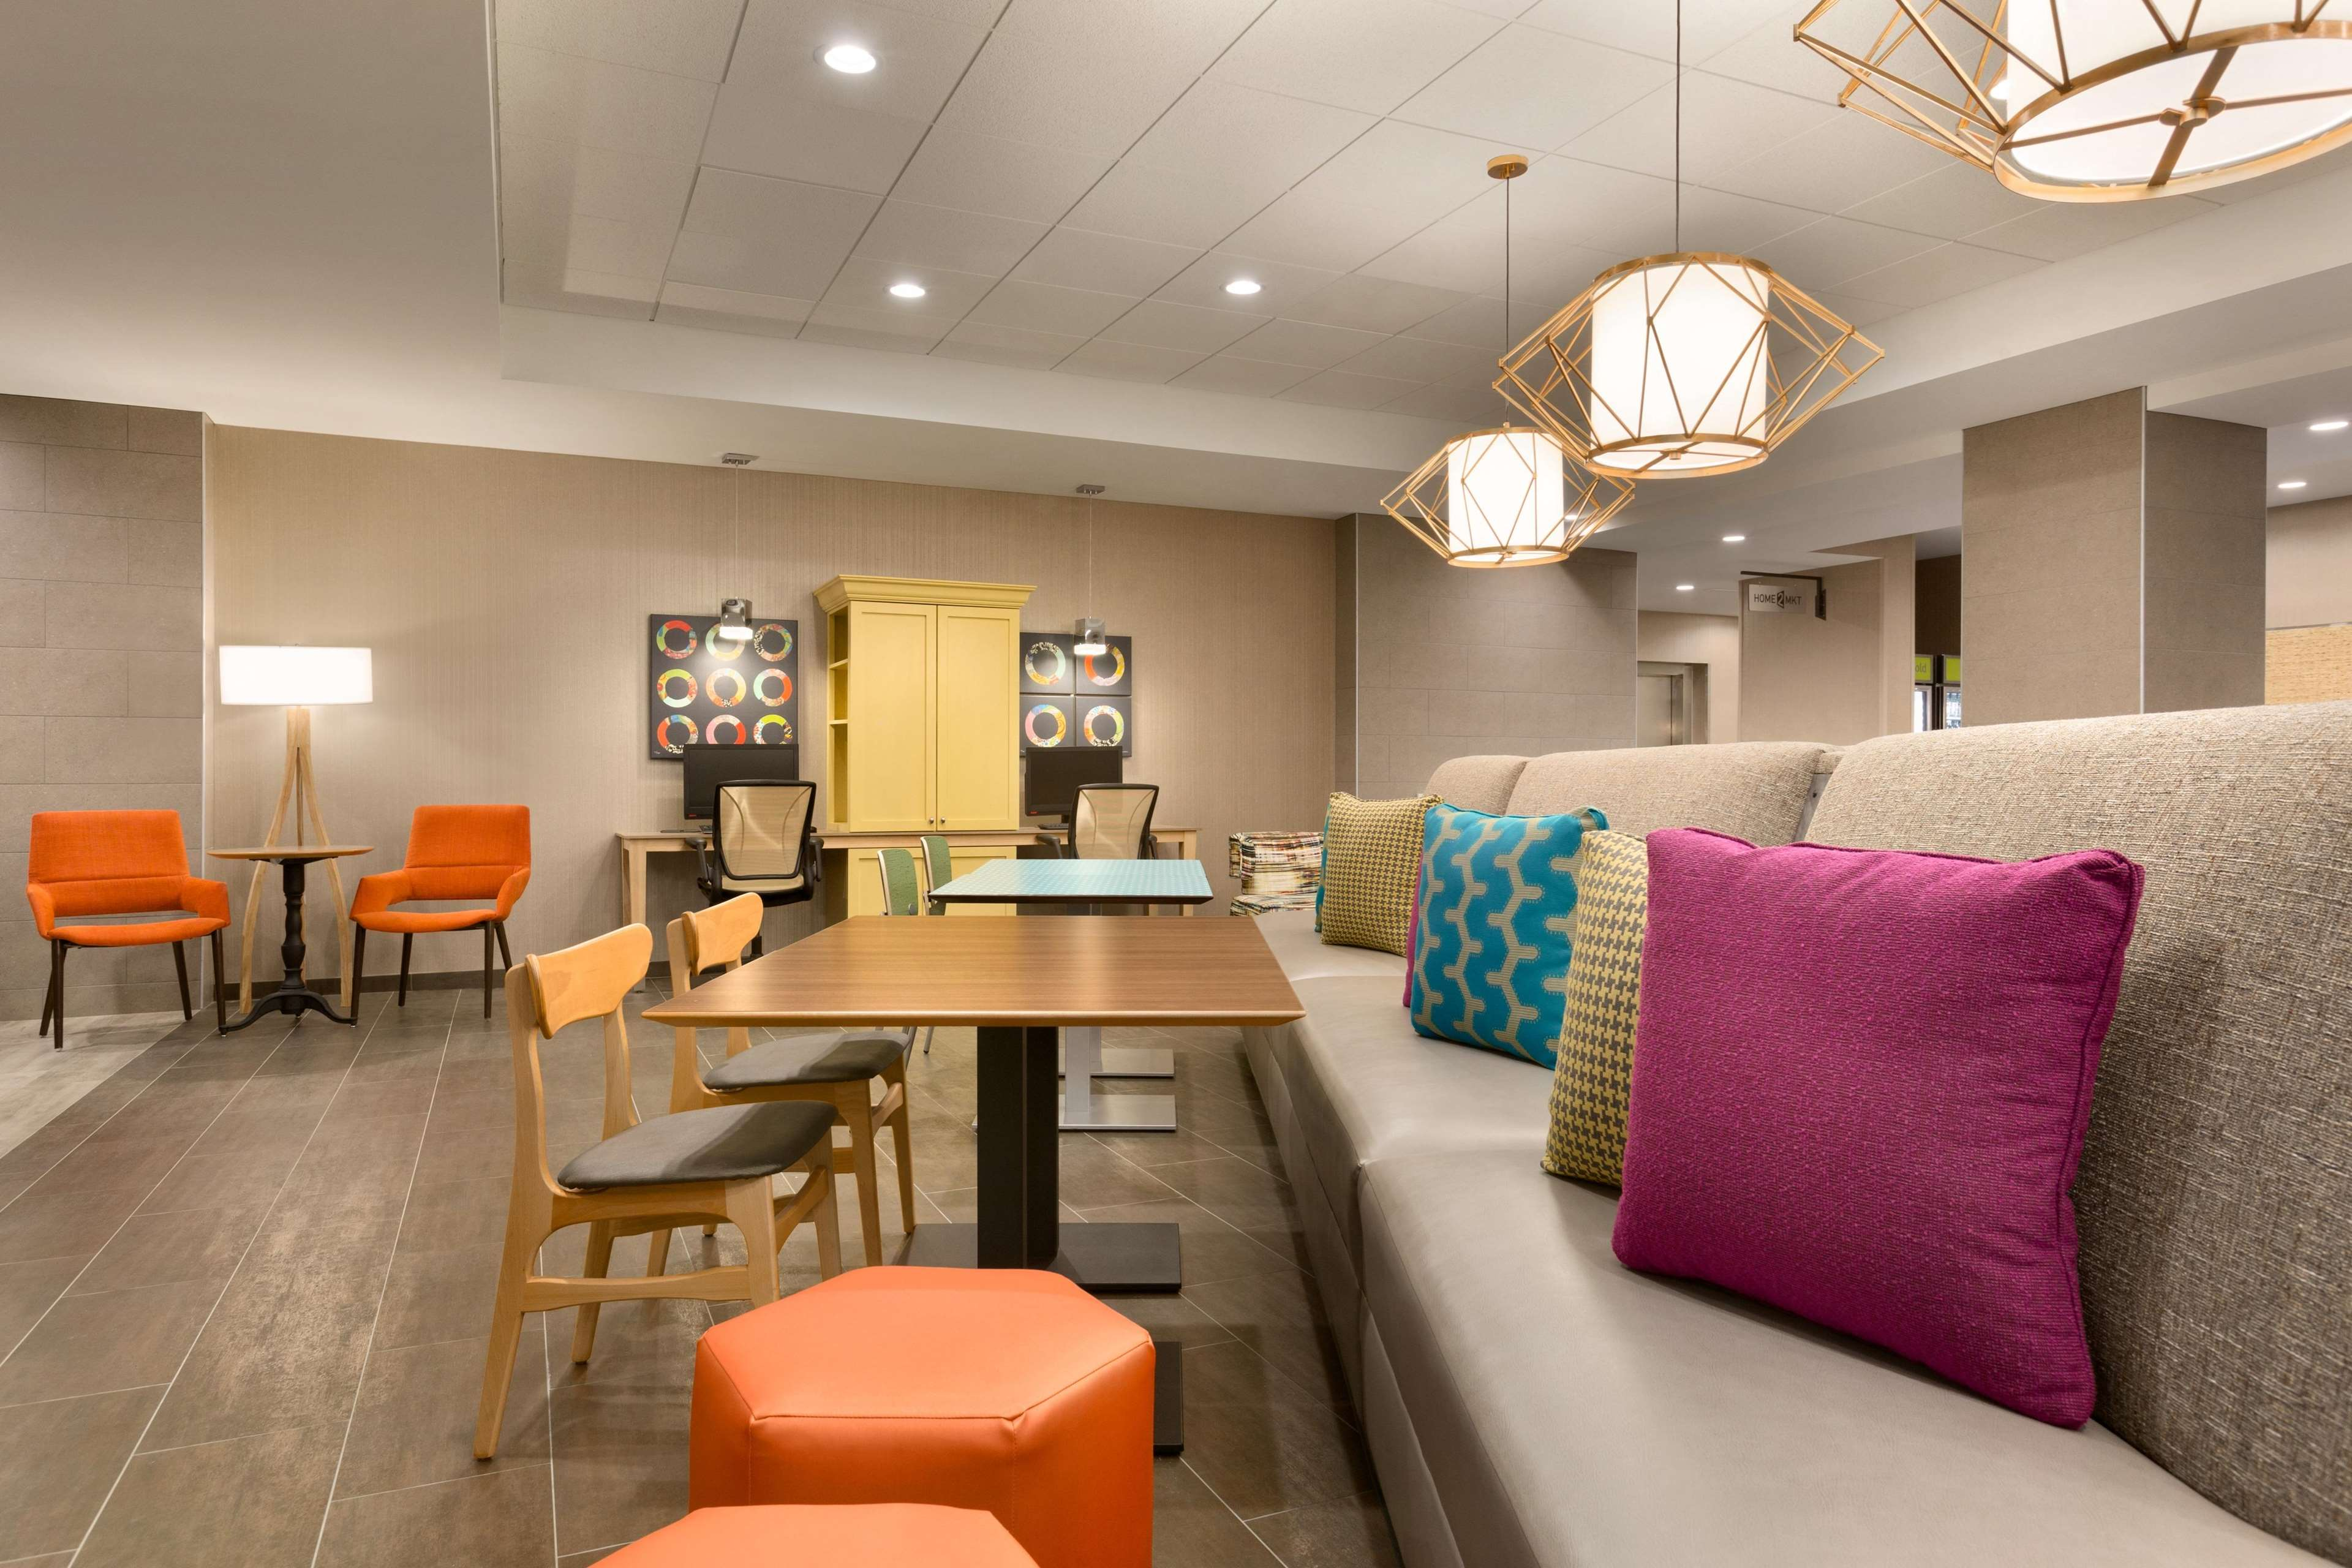 Home2 Suites by Hilton Florence Cincinnati Airport South image 6